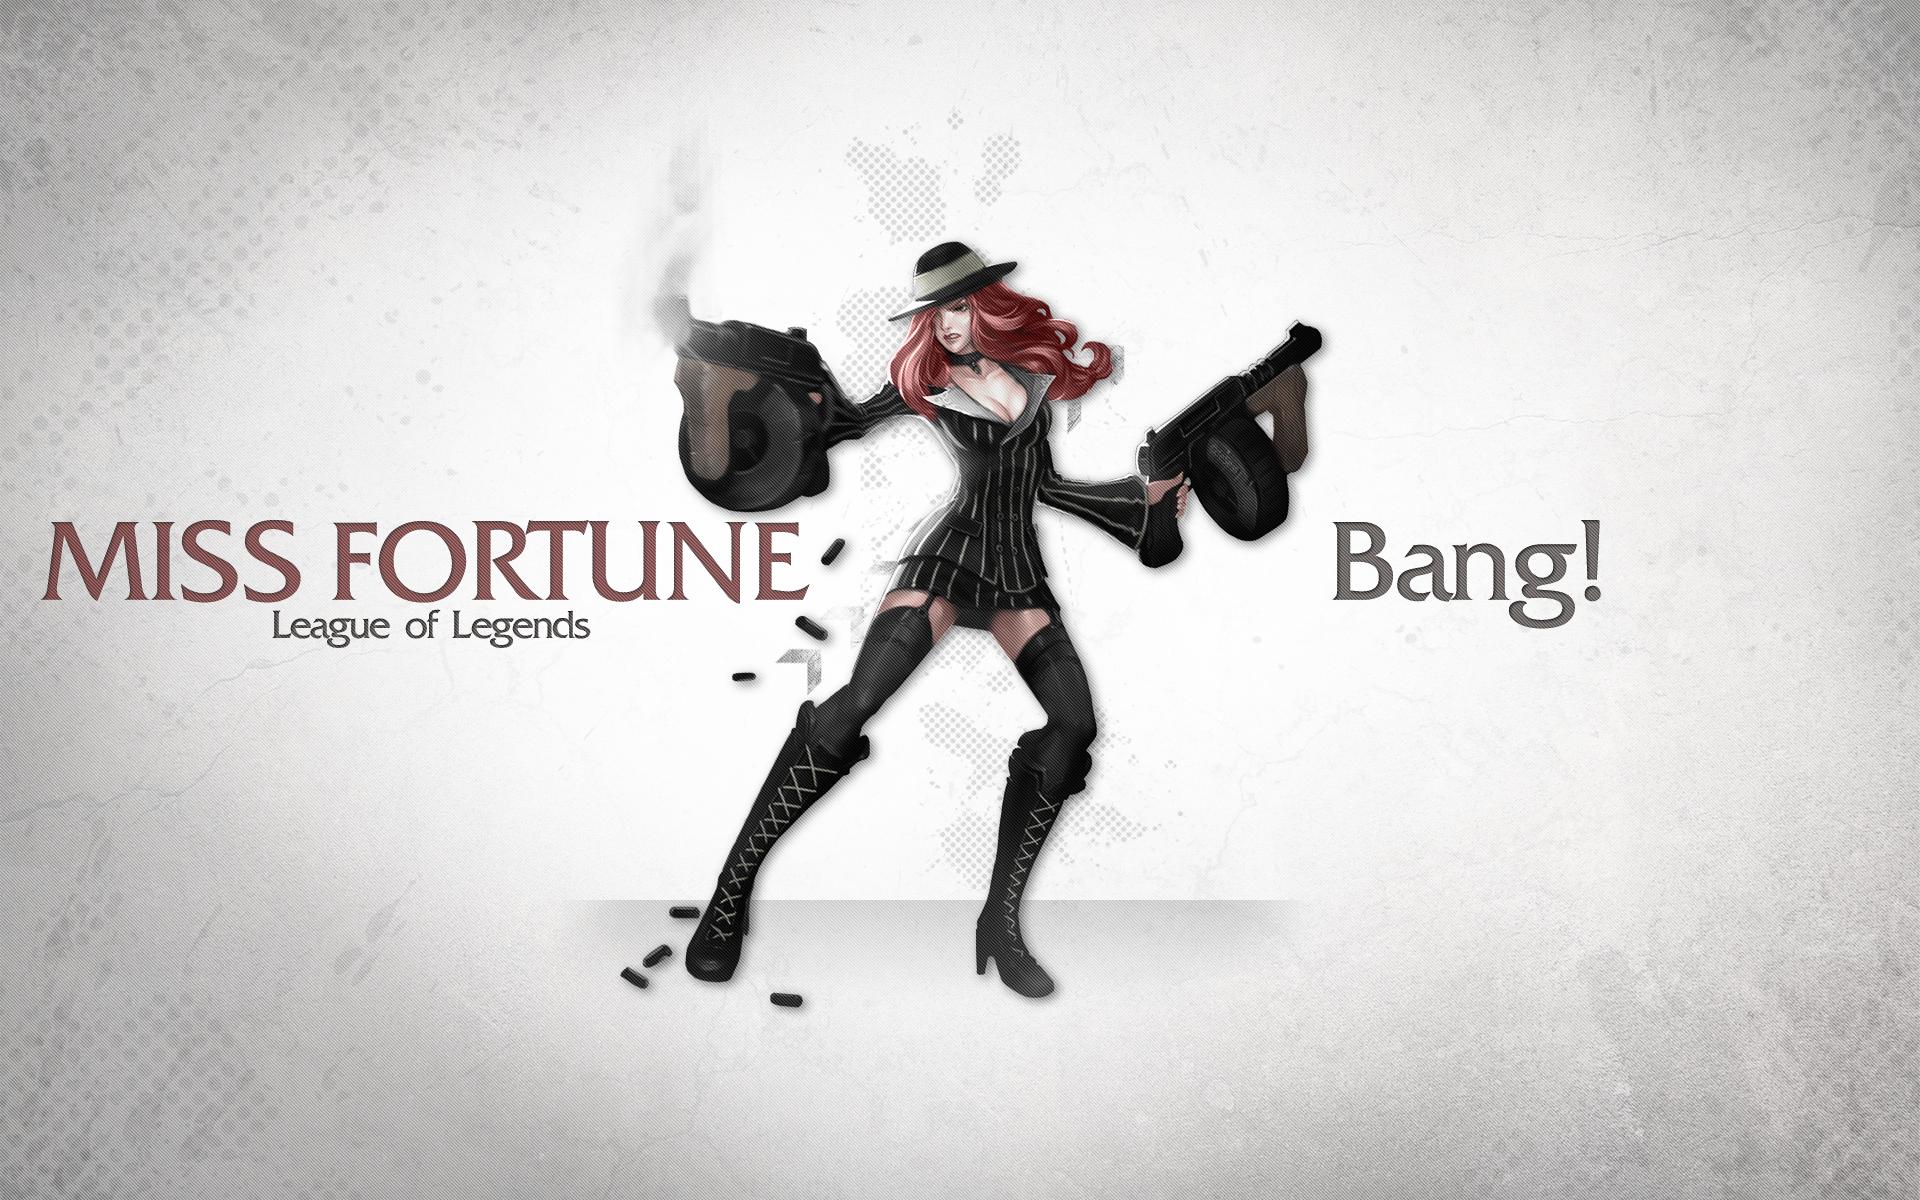 Mafia Miss Fortune wallpaper